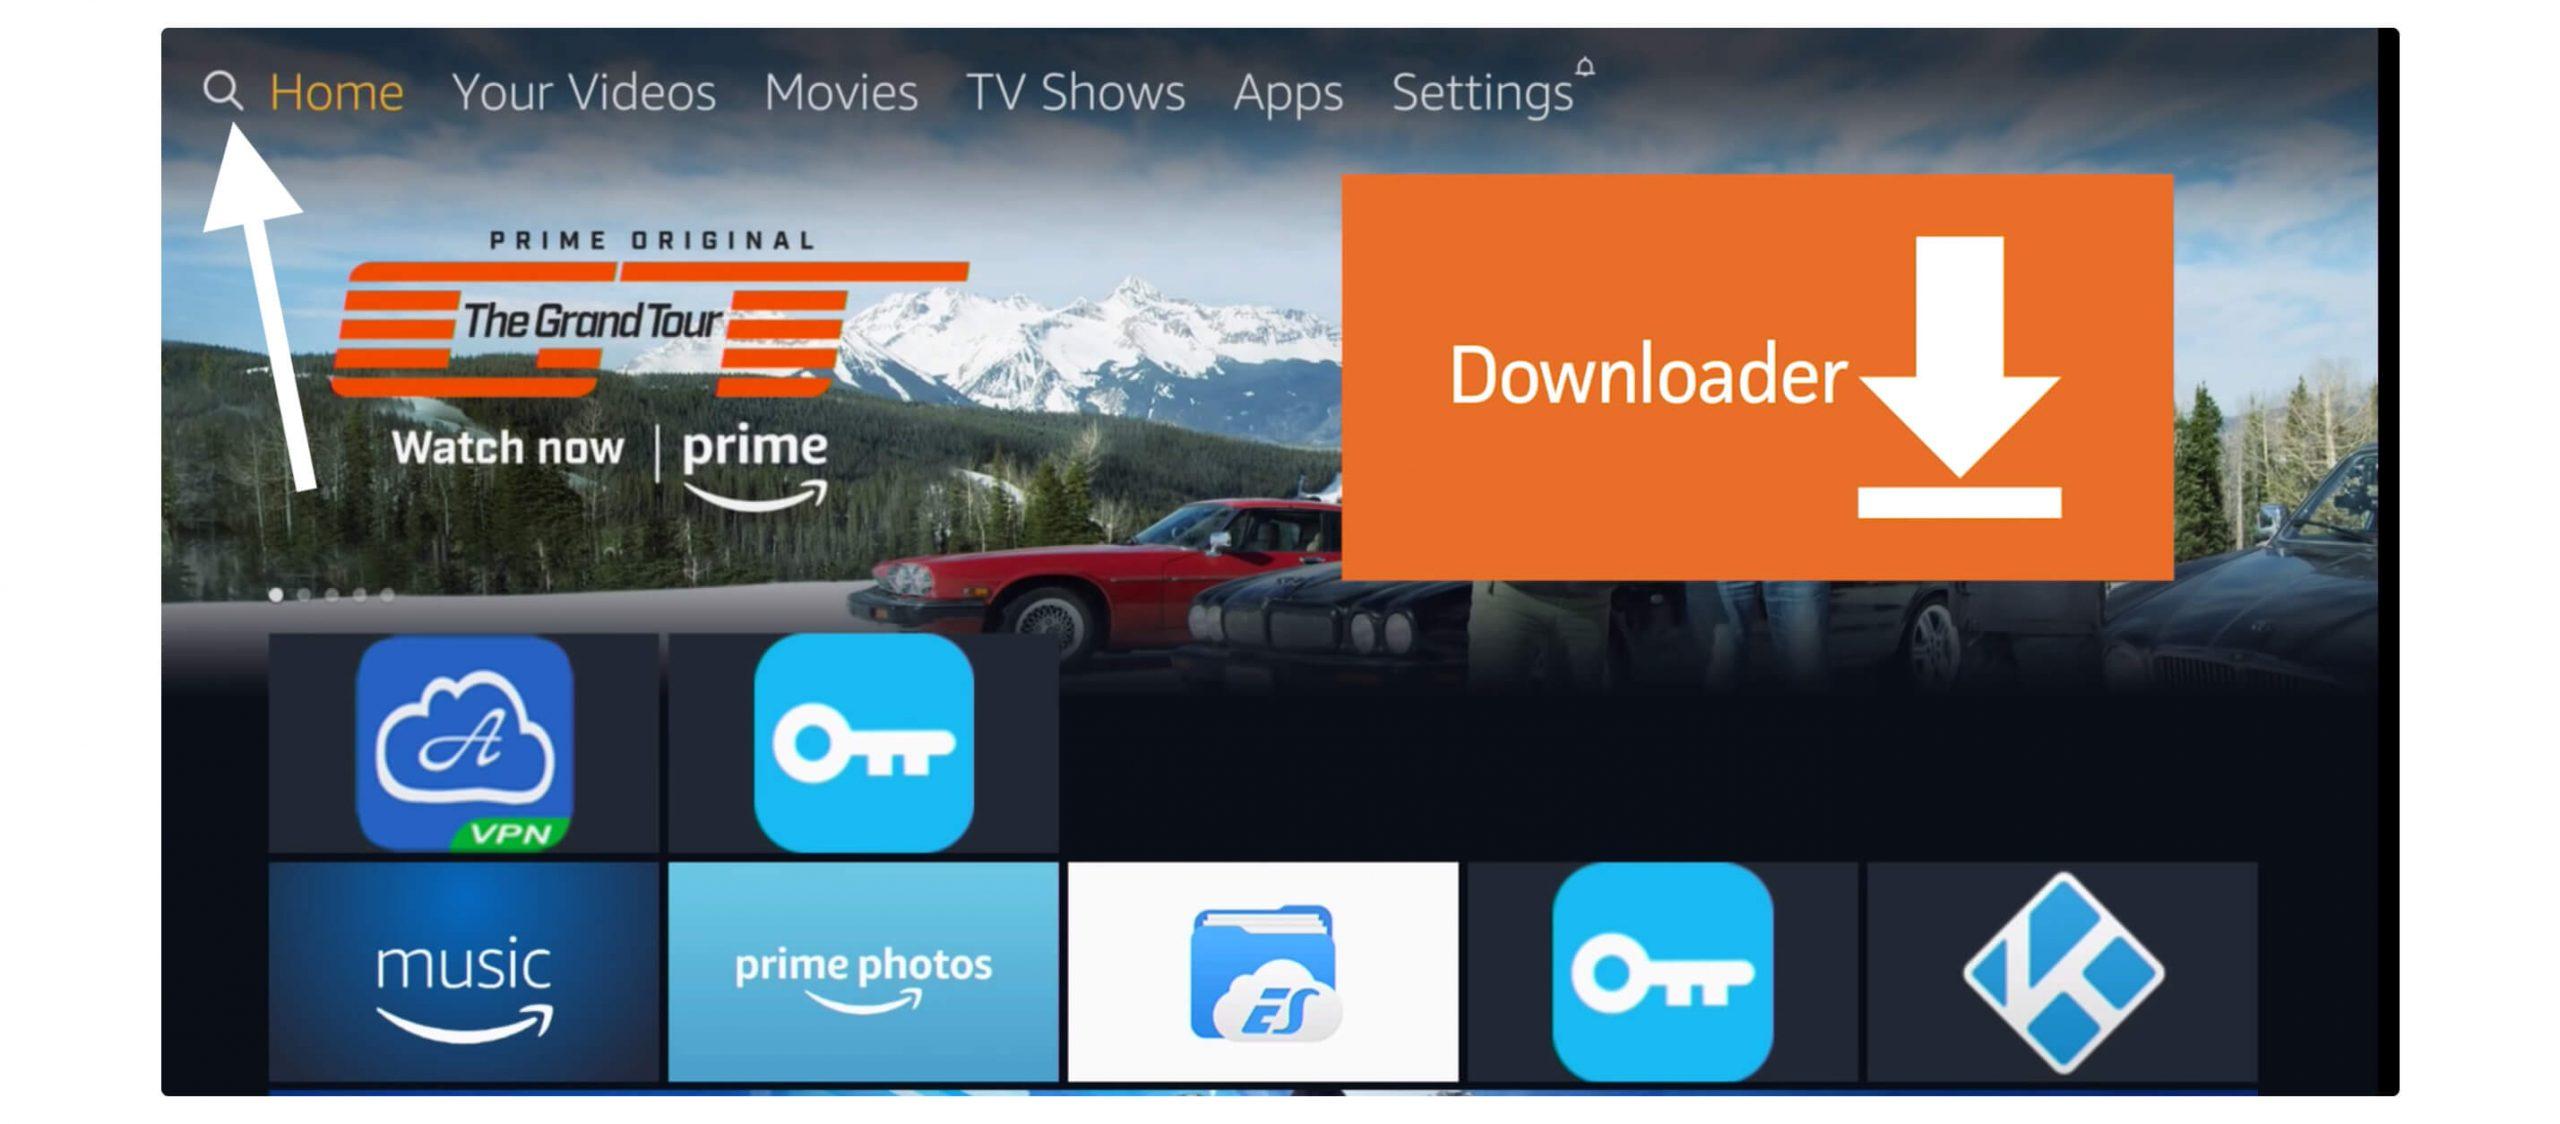 Install-downloader-On-Firestick-